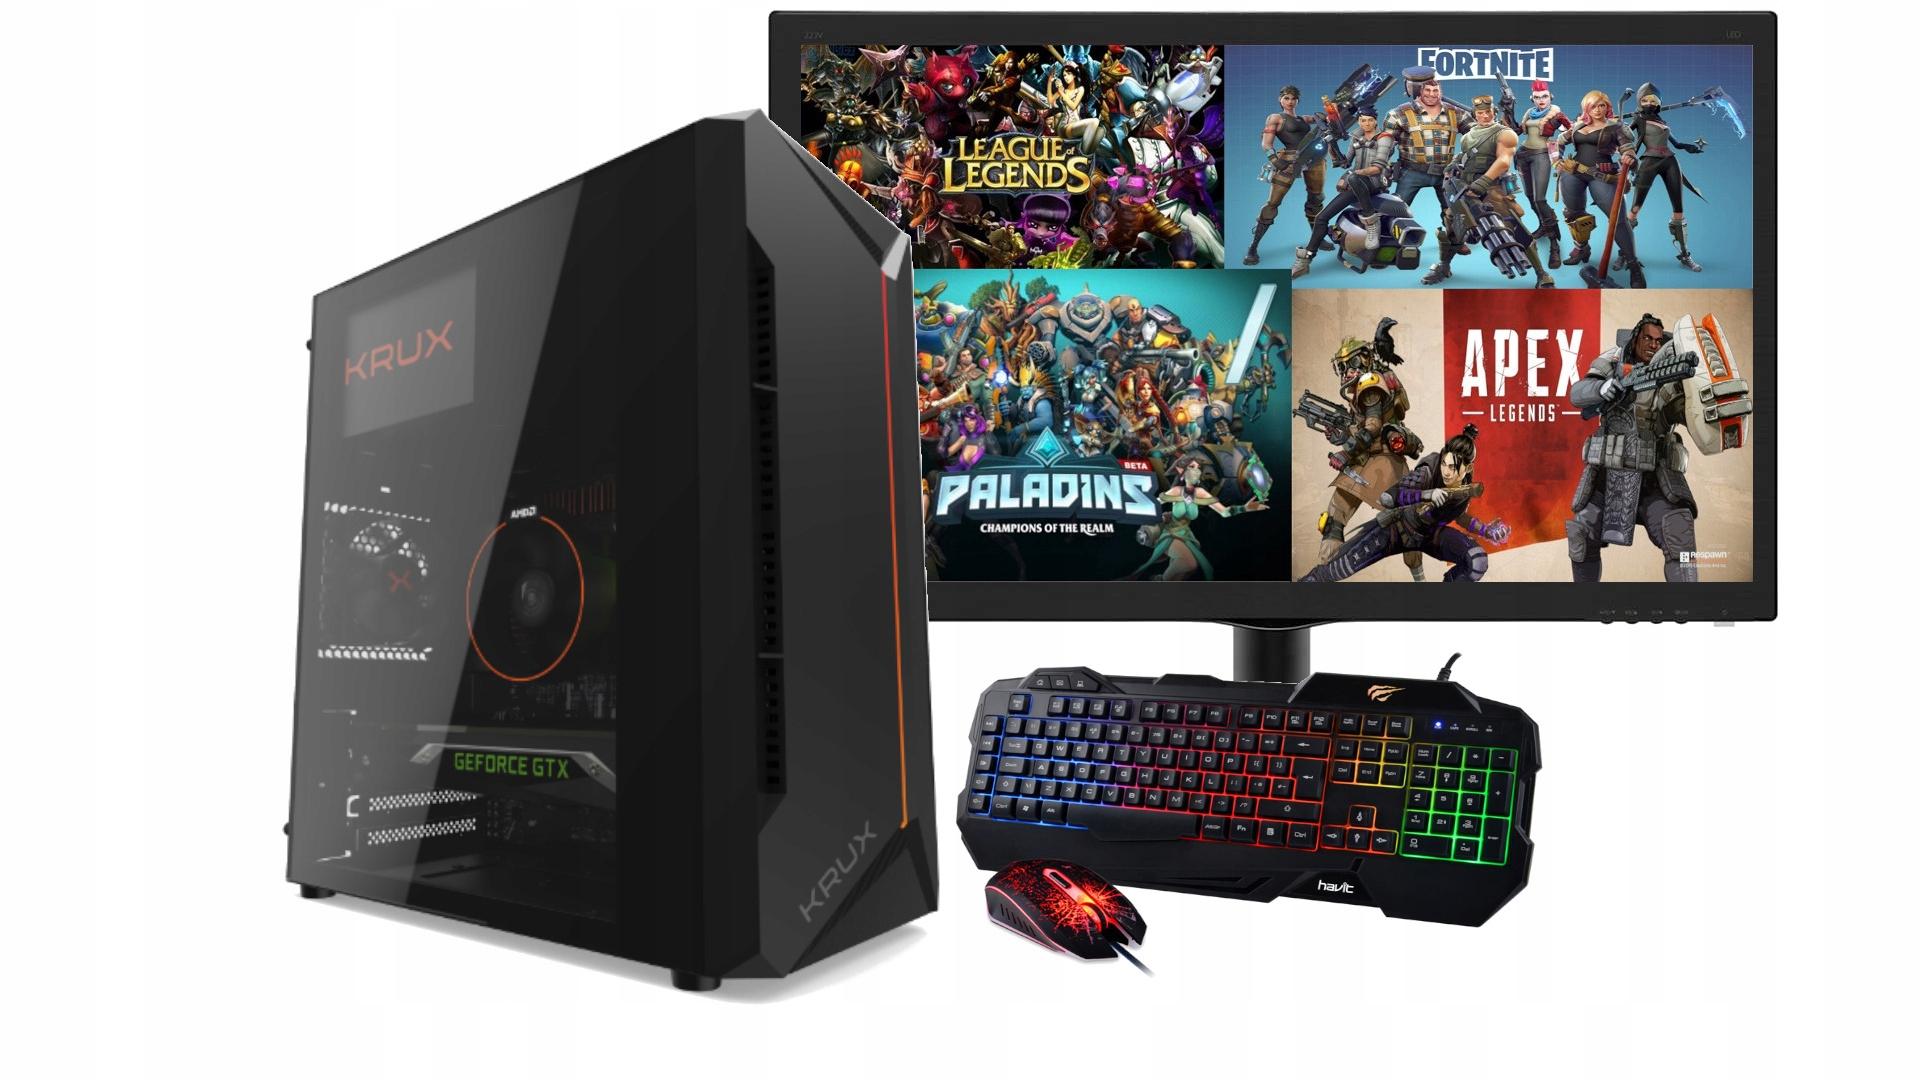 Zestaw Do Gier I5 Gt1030 8gb Monitor 22 Win10 Wifi Sklep I Komputery Stacjonarne Allegro Pl